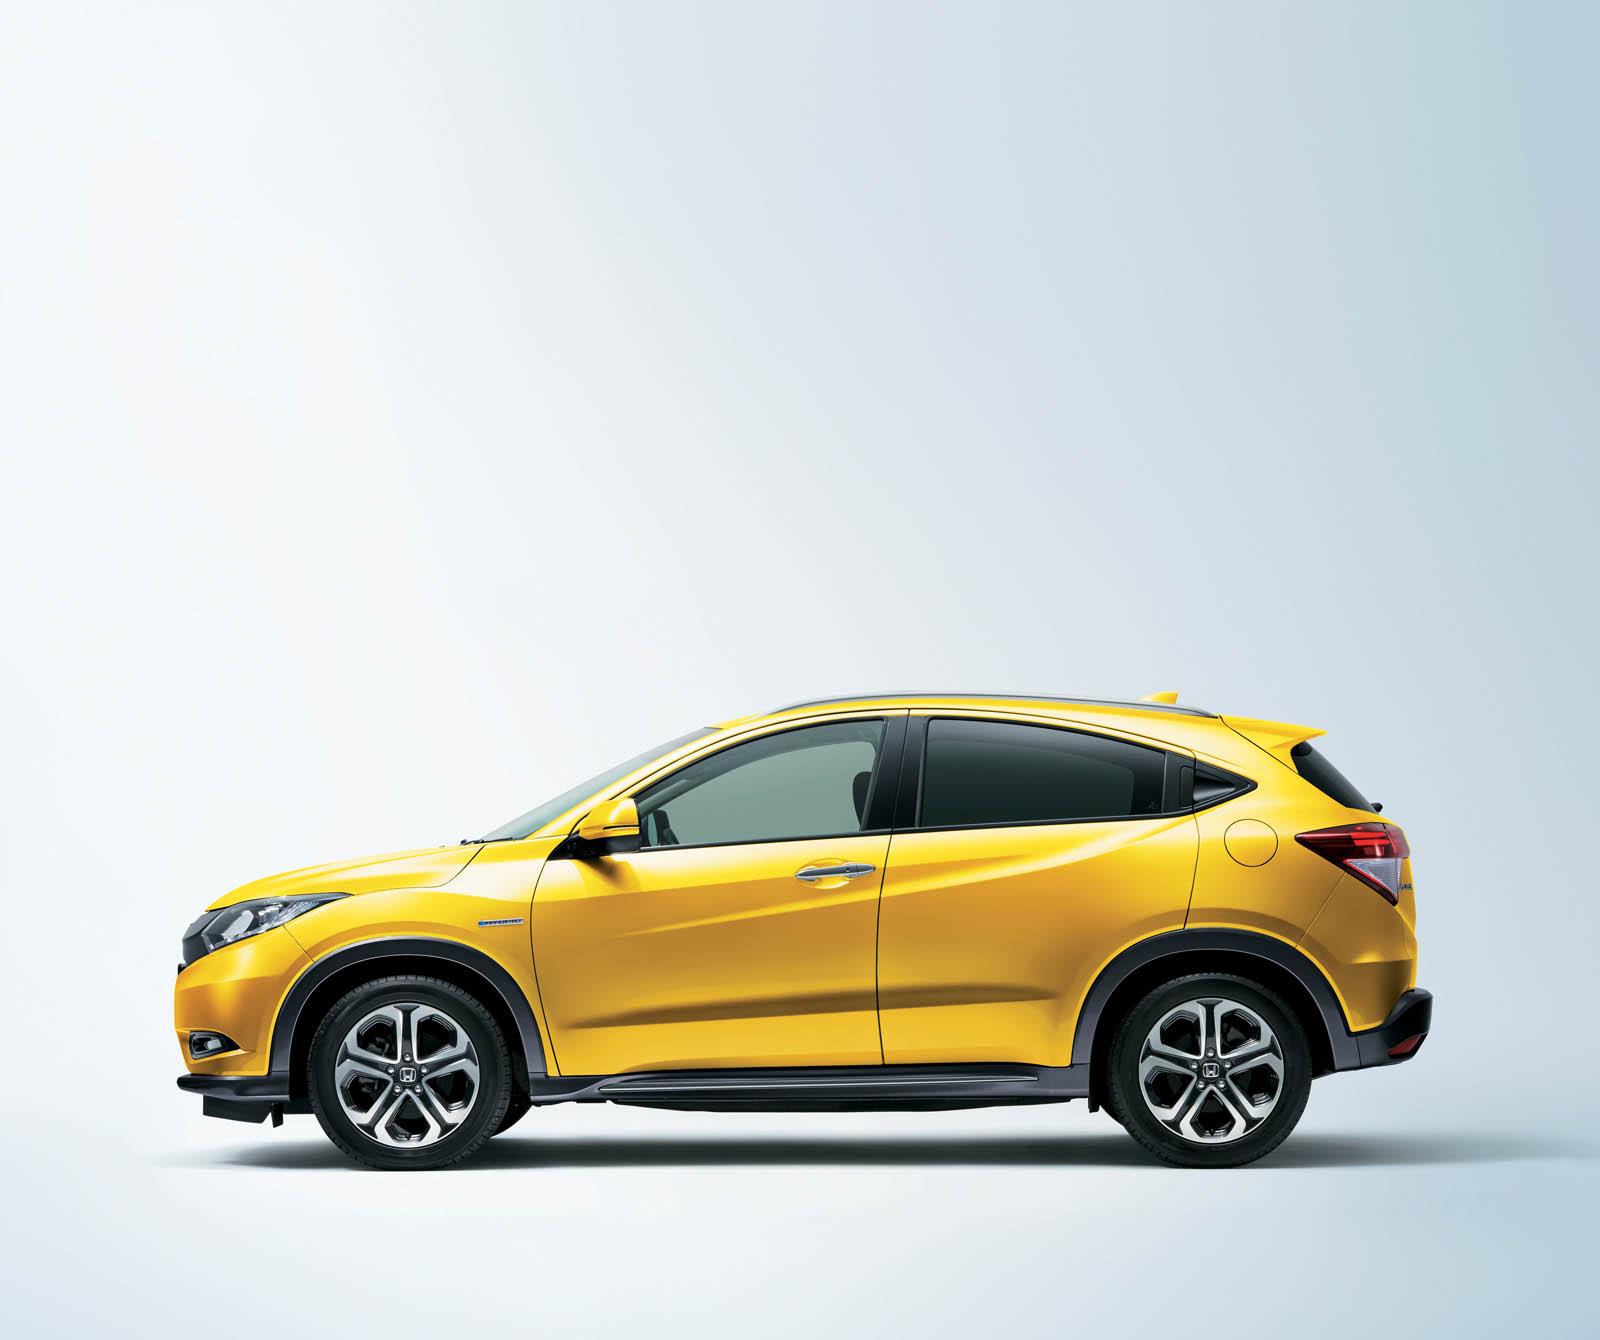 Ford Raptor Jump >> Honda Vezel Brilliant Style Edition Spruces Up Japan's